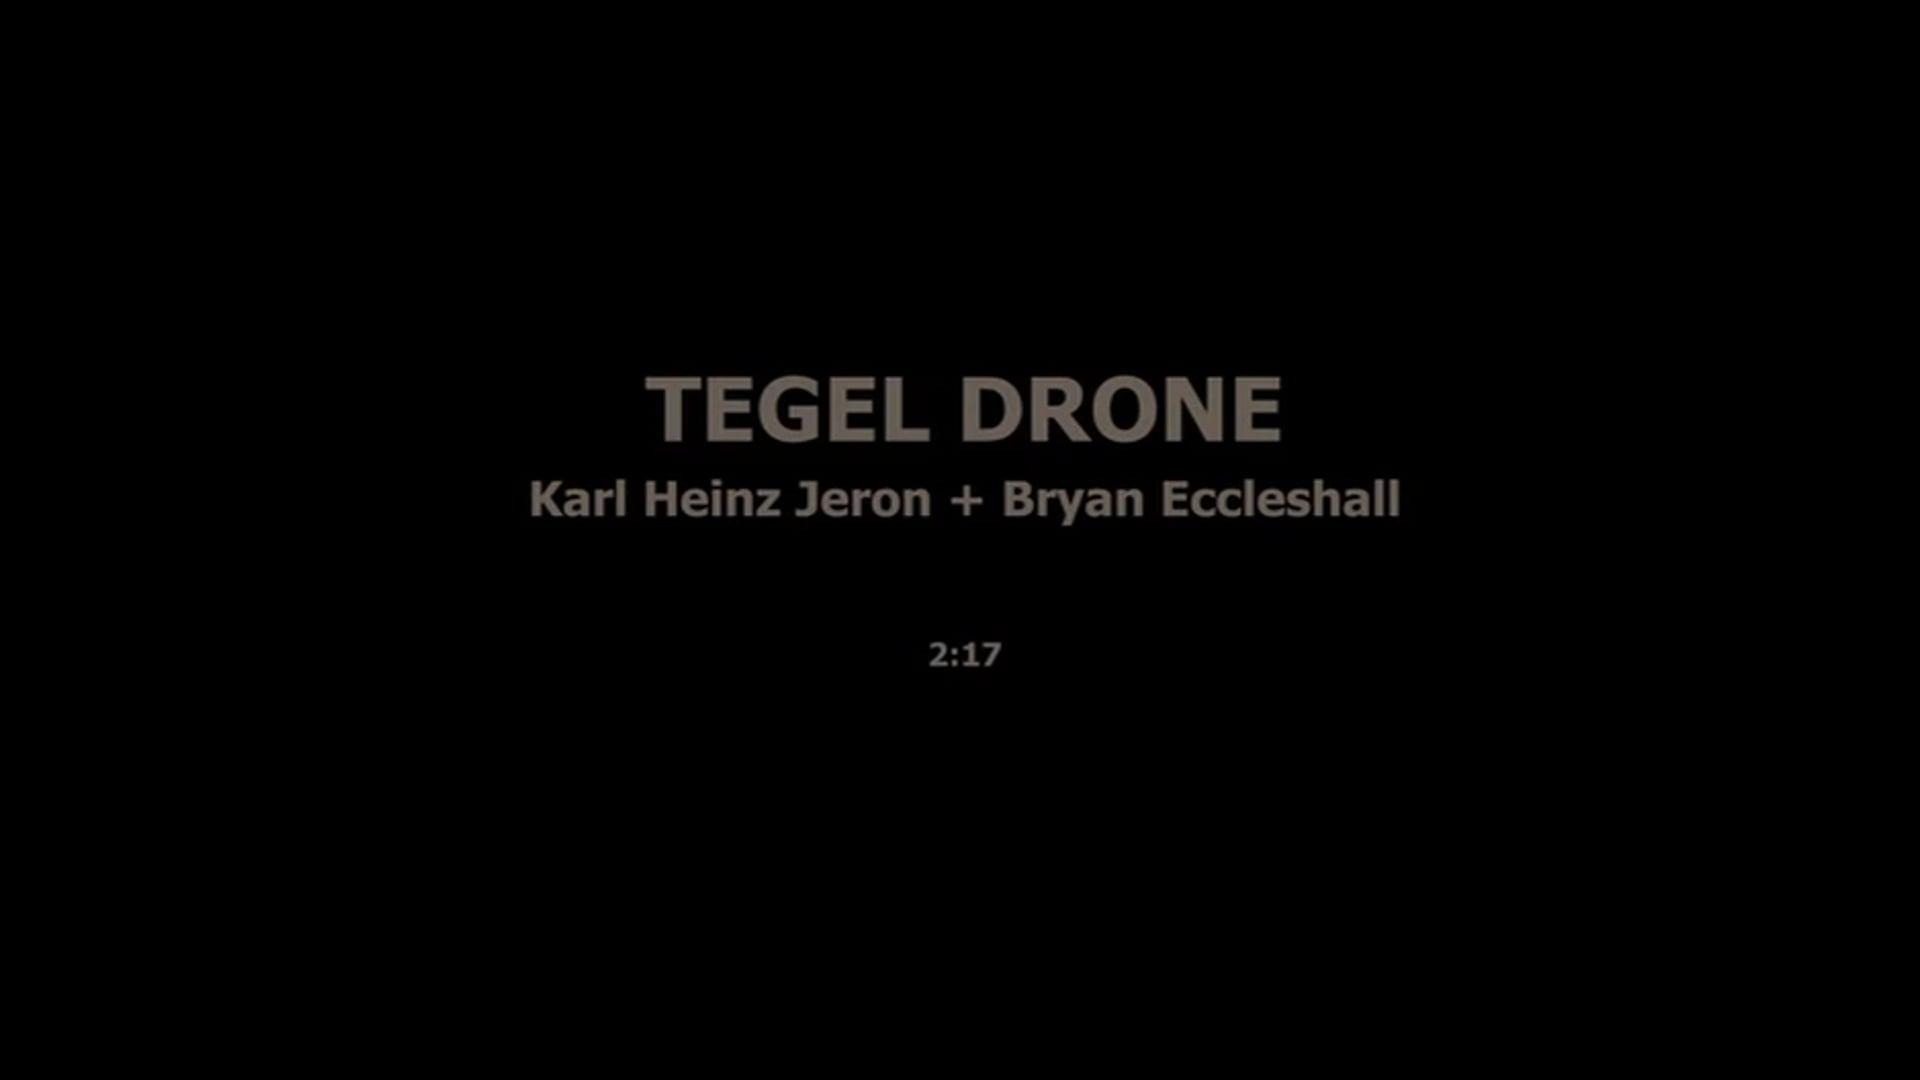 TEGEL DRONE - KARL HEINZ JERON, BRYAN ECCLESHALL